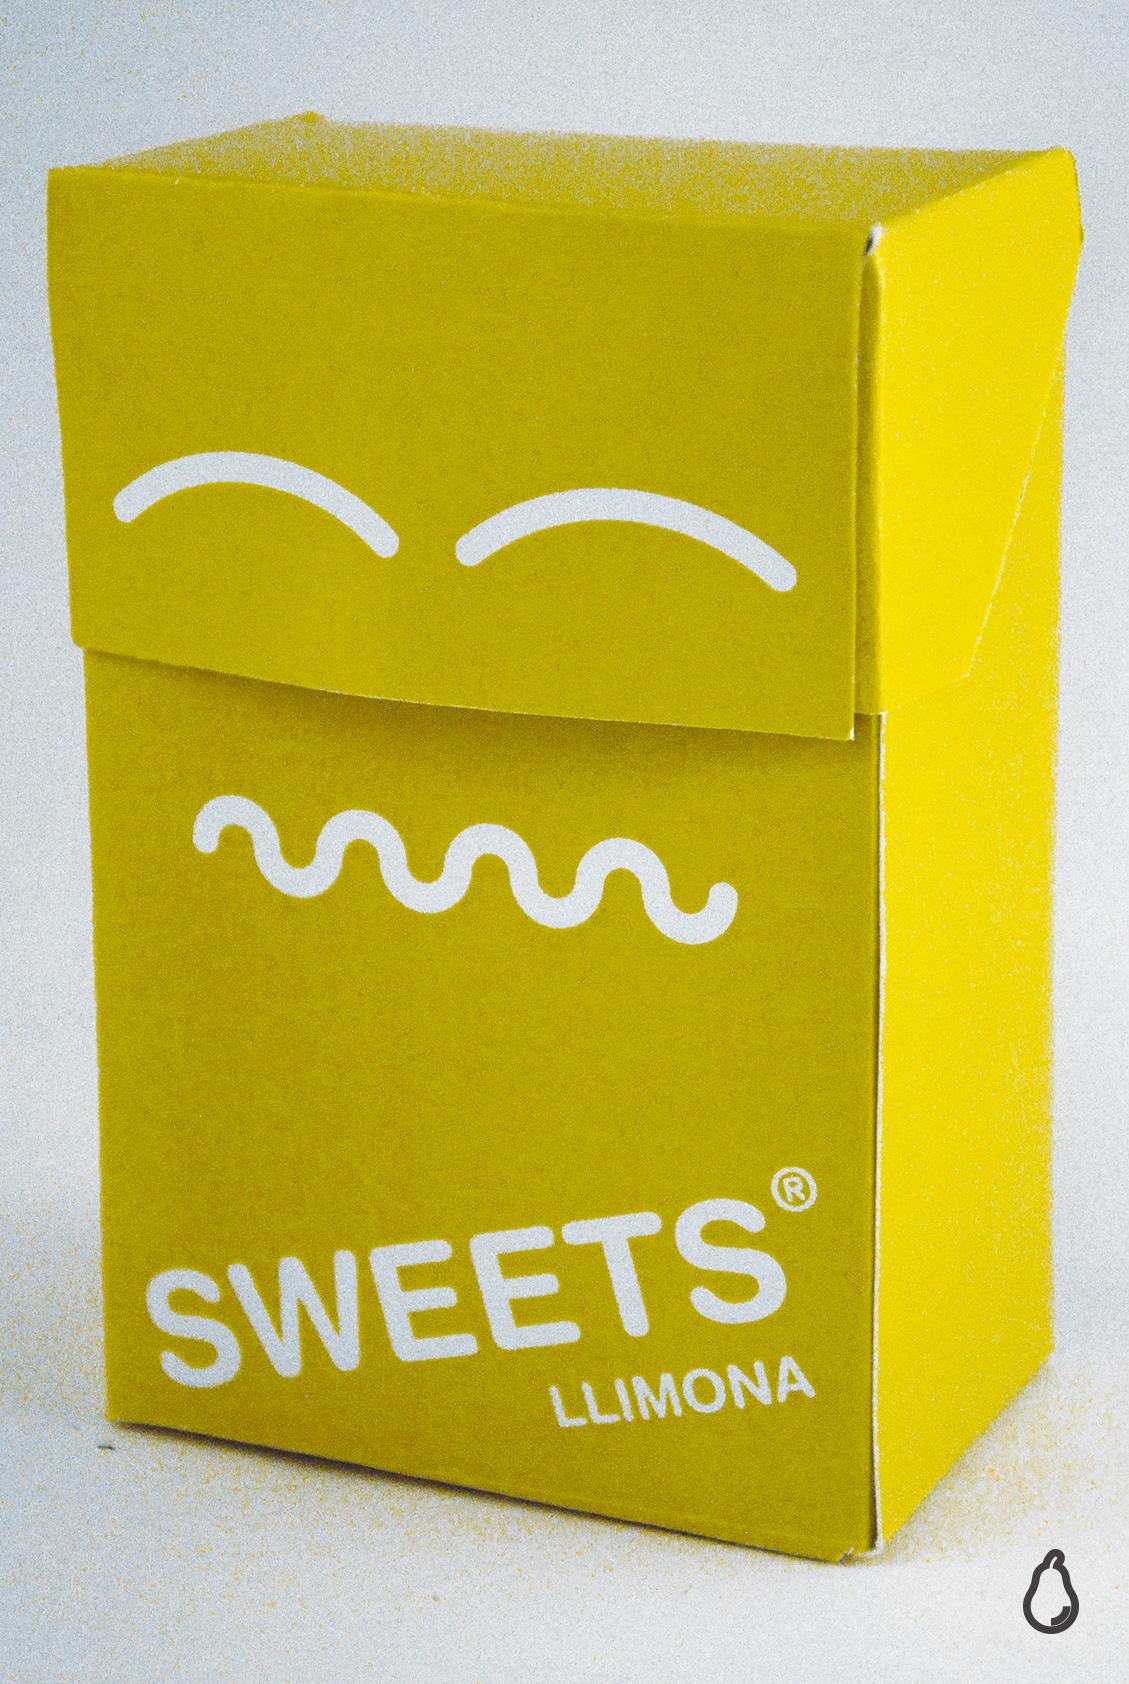 Sweets---llimona